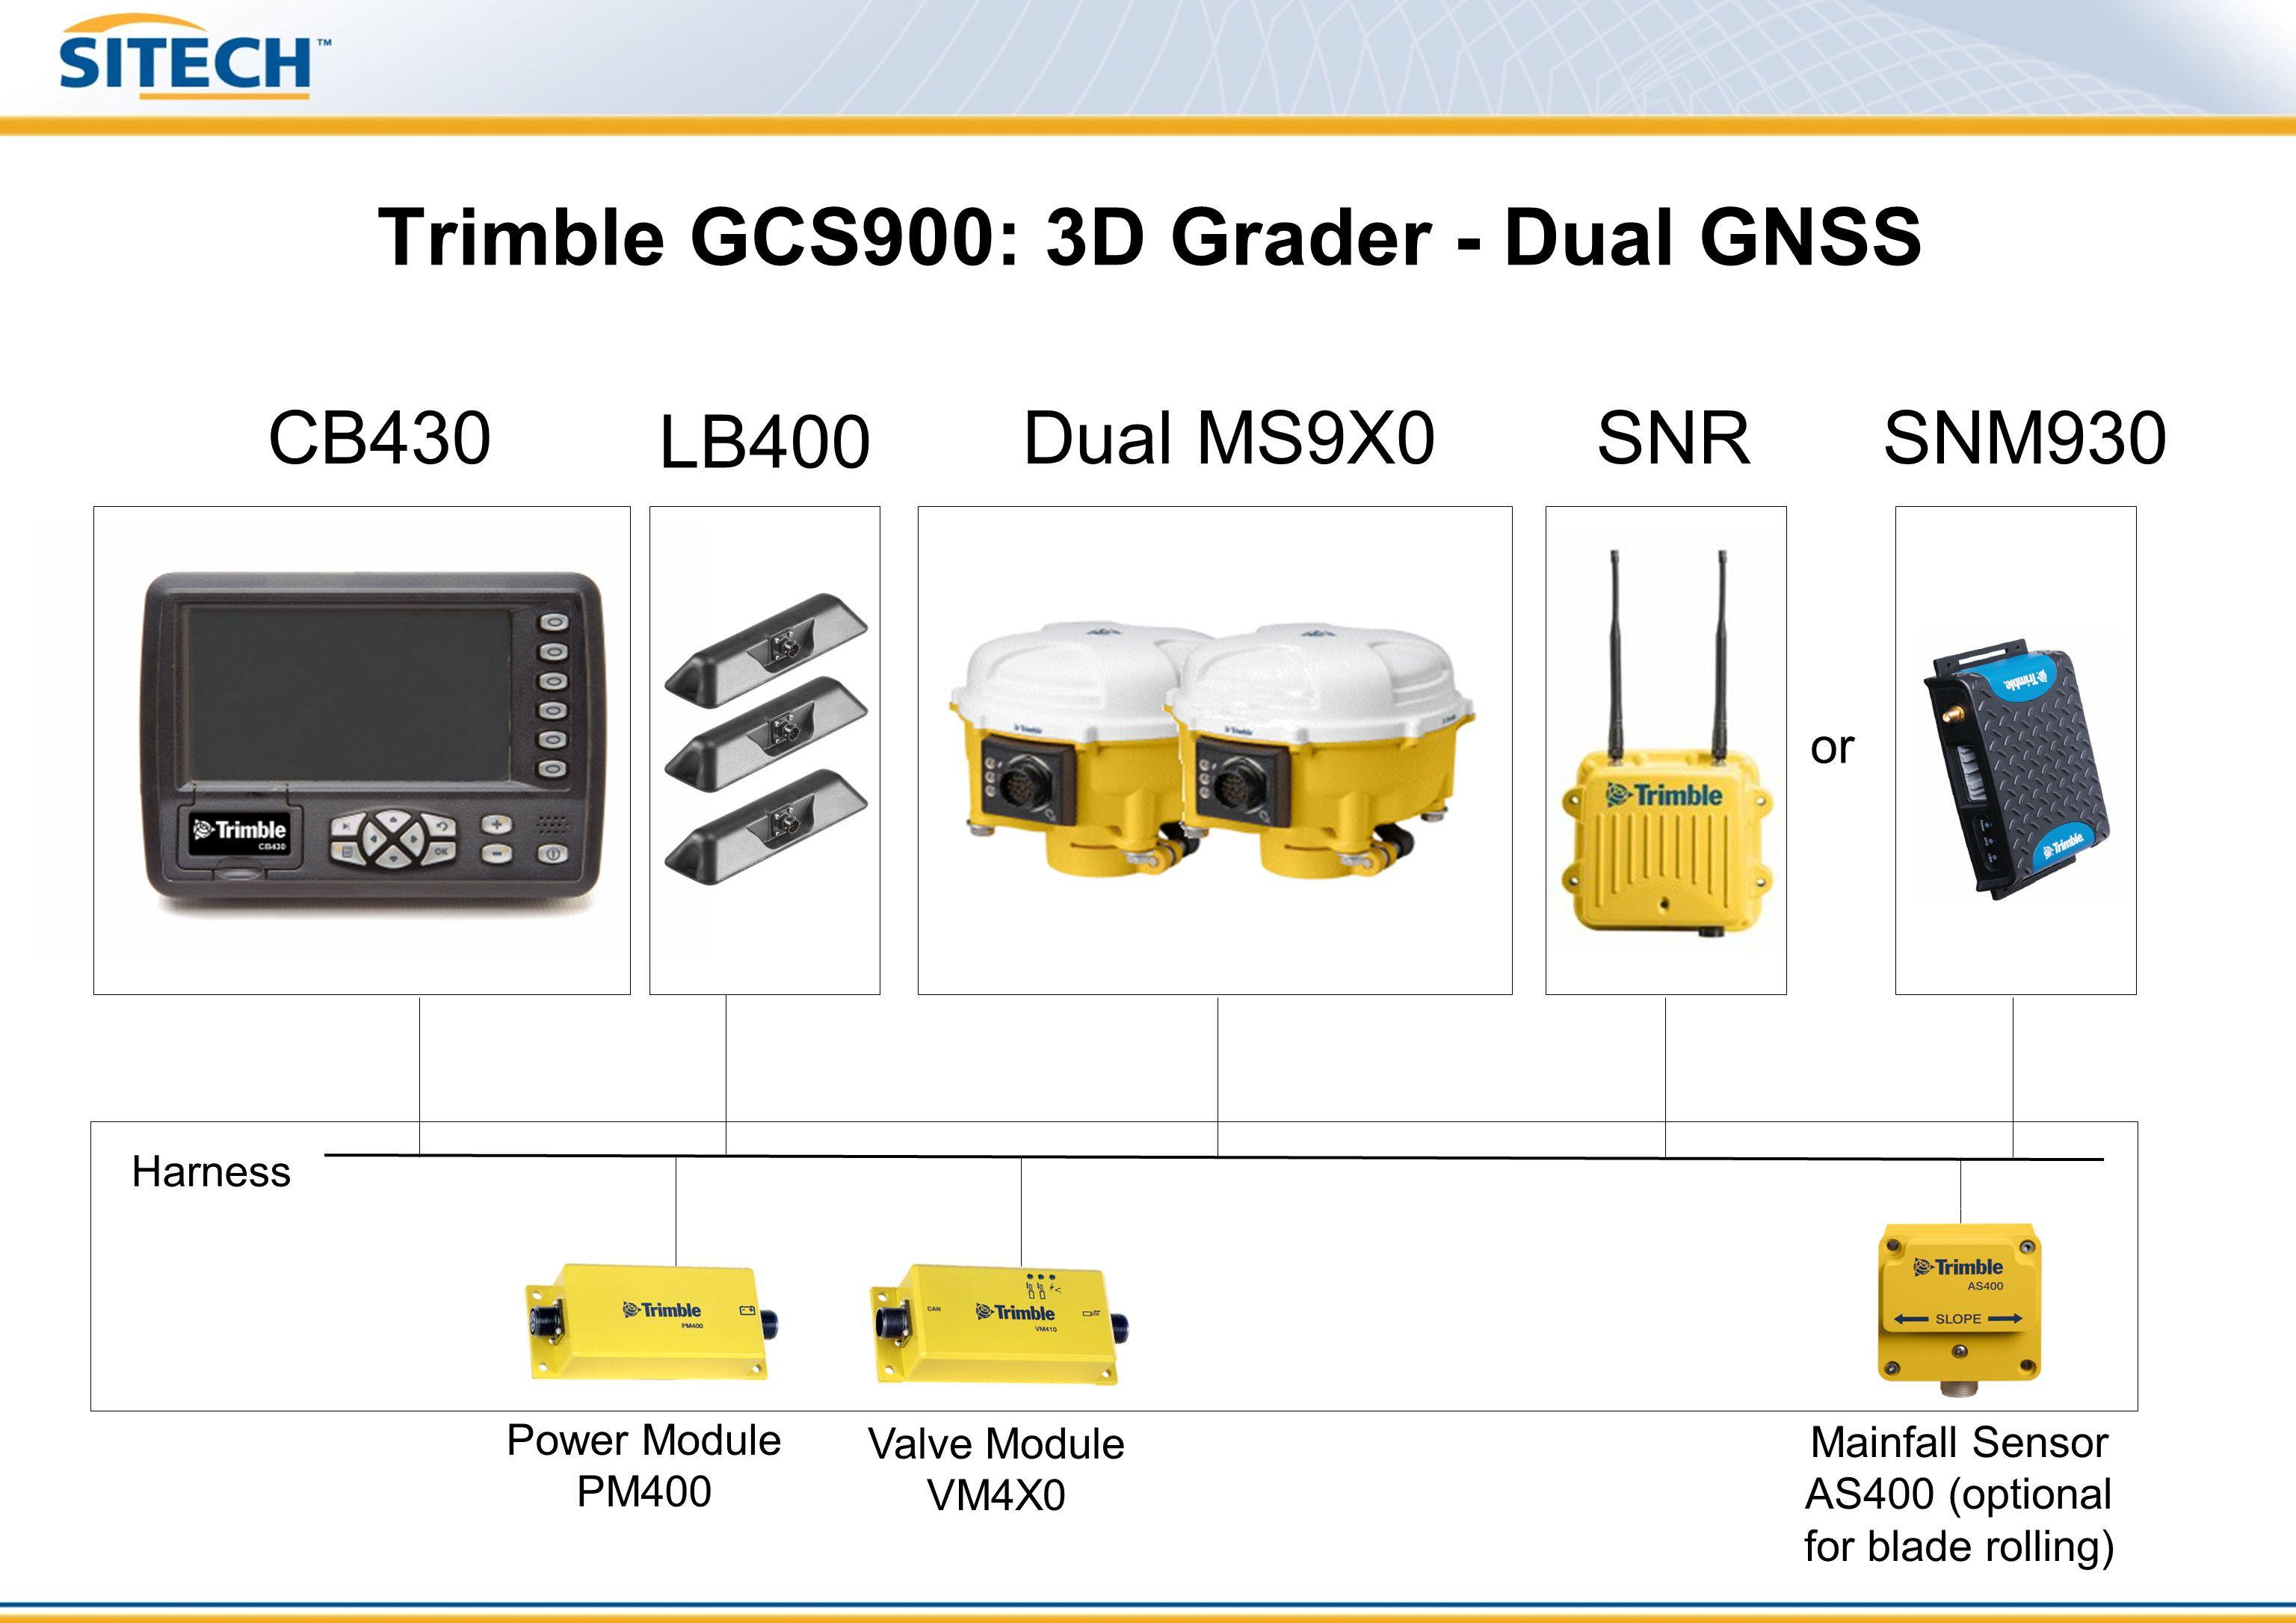 Trimble GCS900: 3D Grader - Dual GNSS